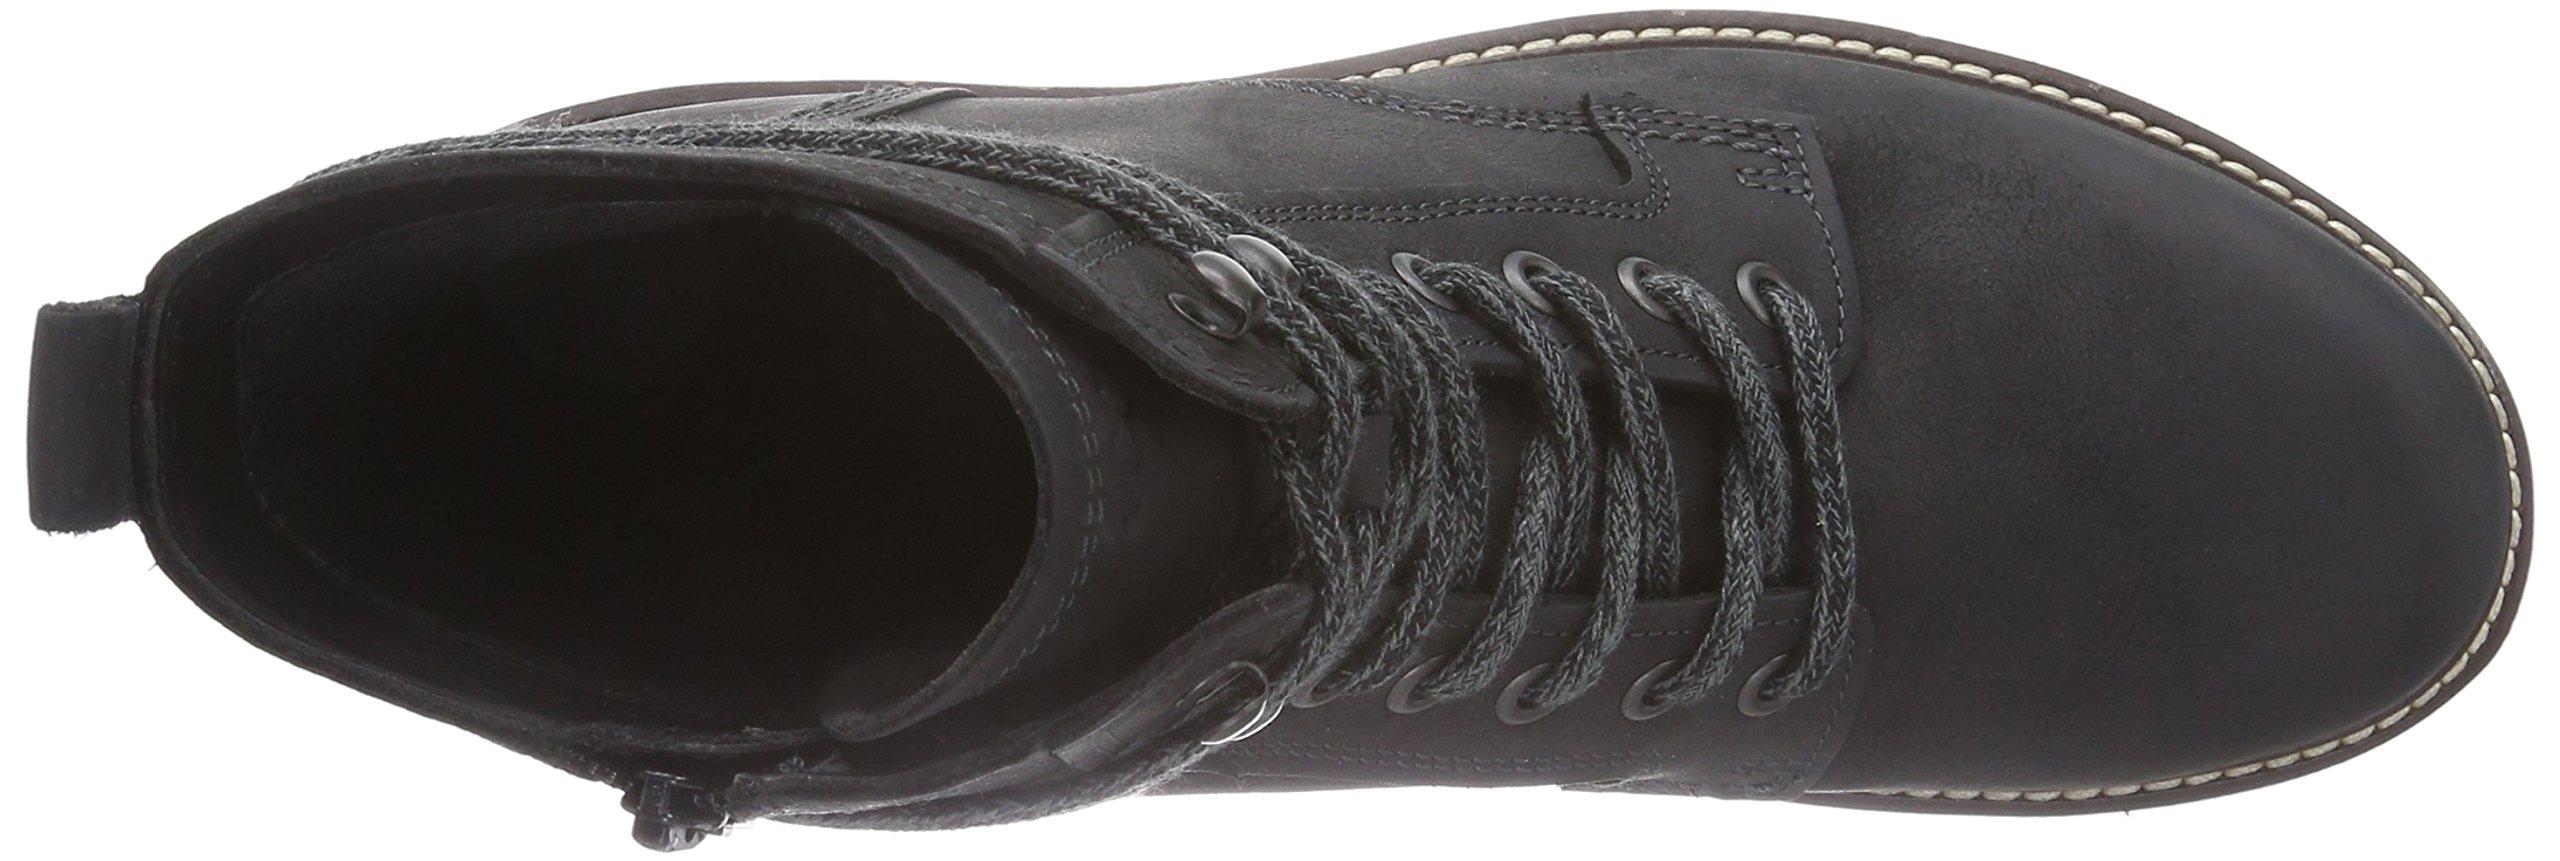 Ecco Footwear Womens Elaine Boot, Black, 37 EU/6-6.5 M US by ECCO (Image #8)